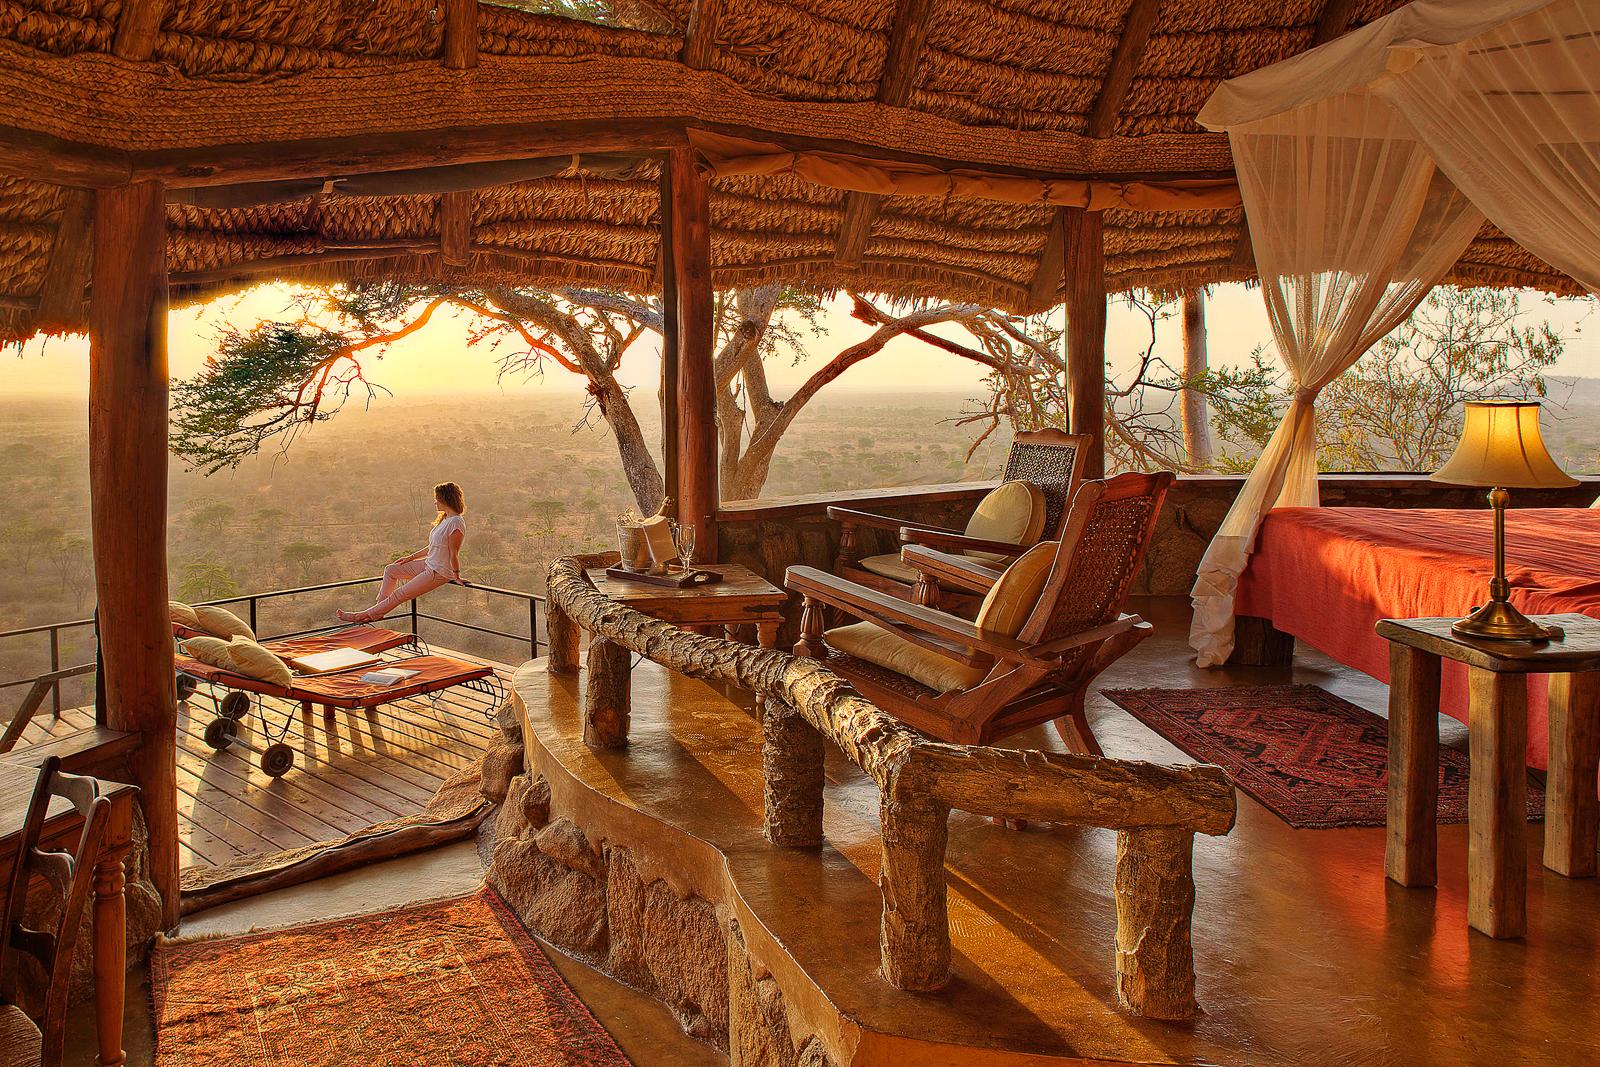 Kenya Safari Lodge - Africa Travel Company